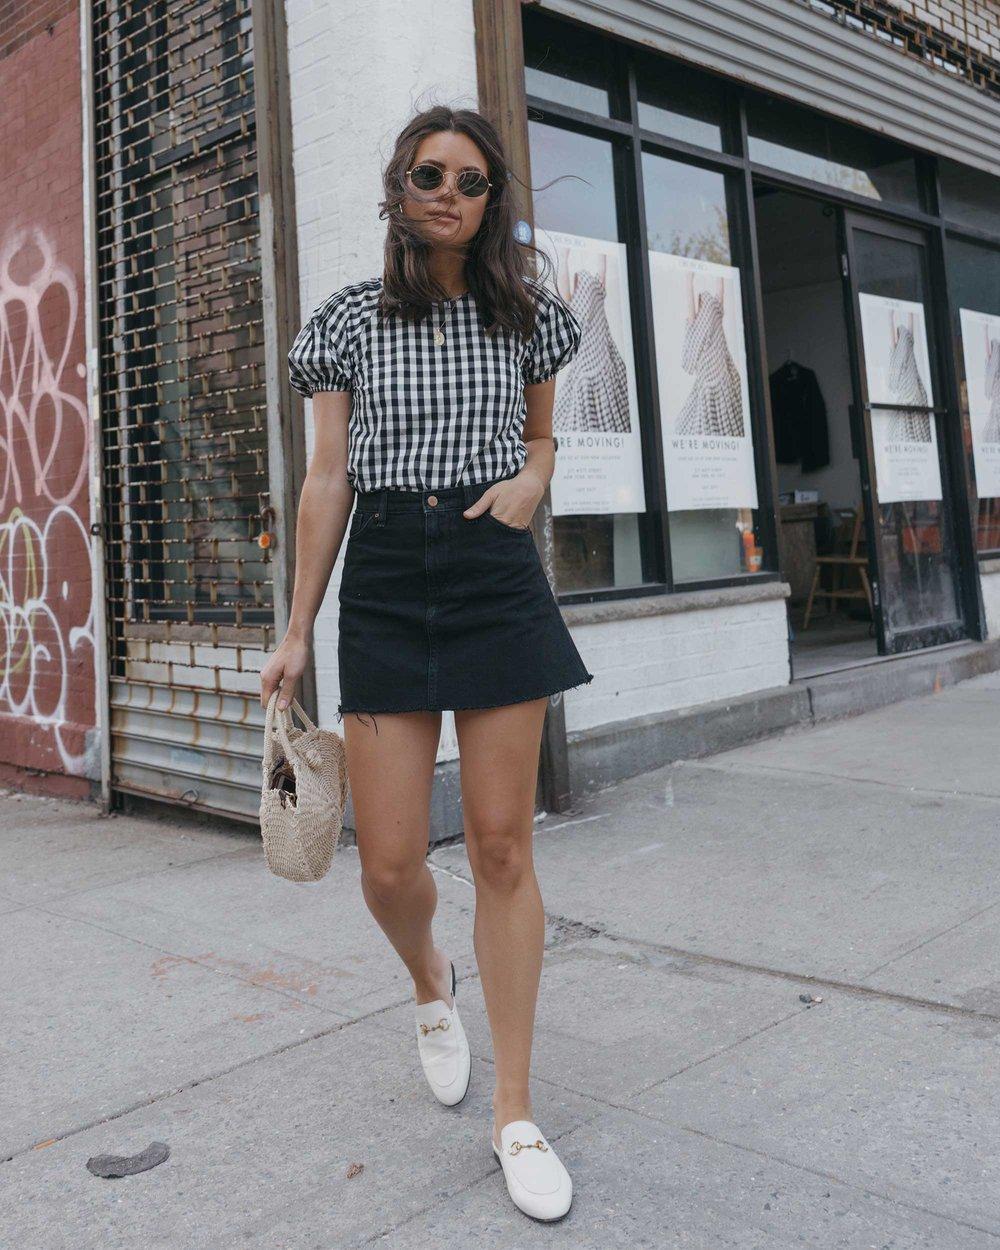 Gingham Blouse in New York — Sarah Christine